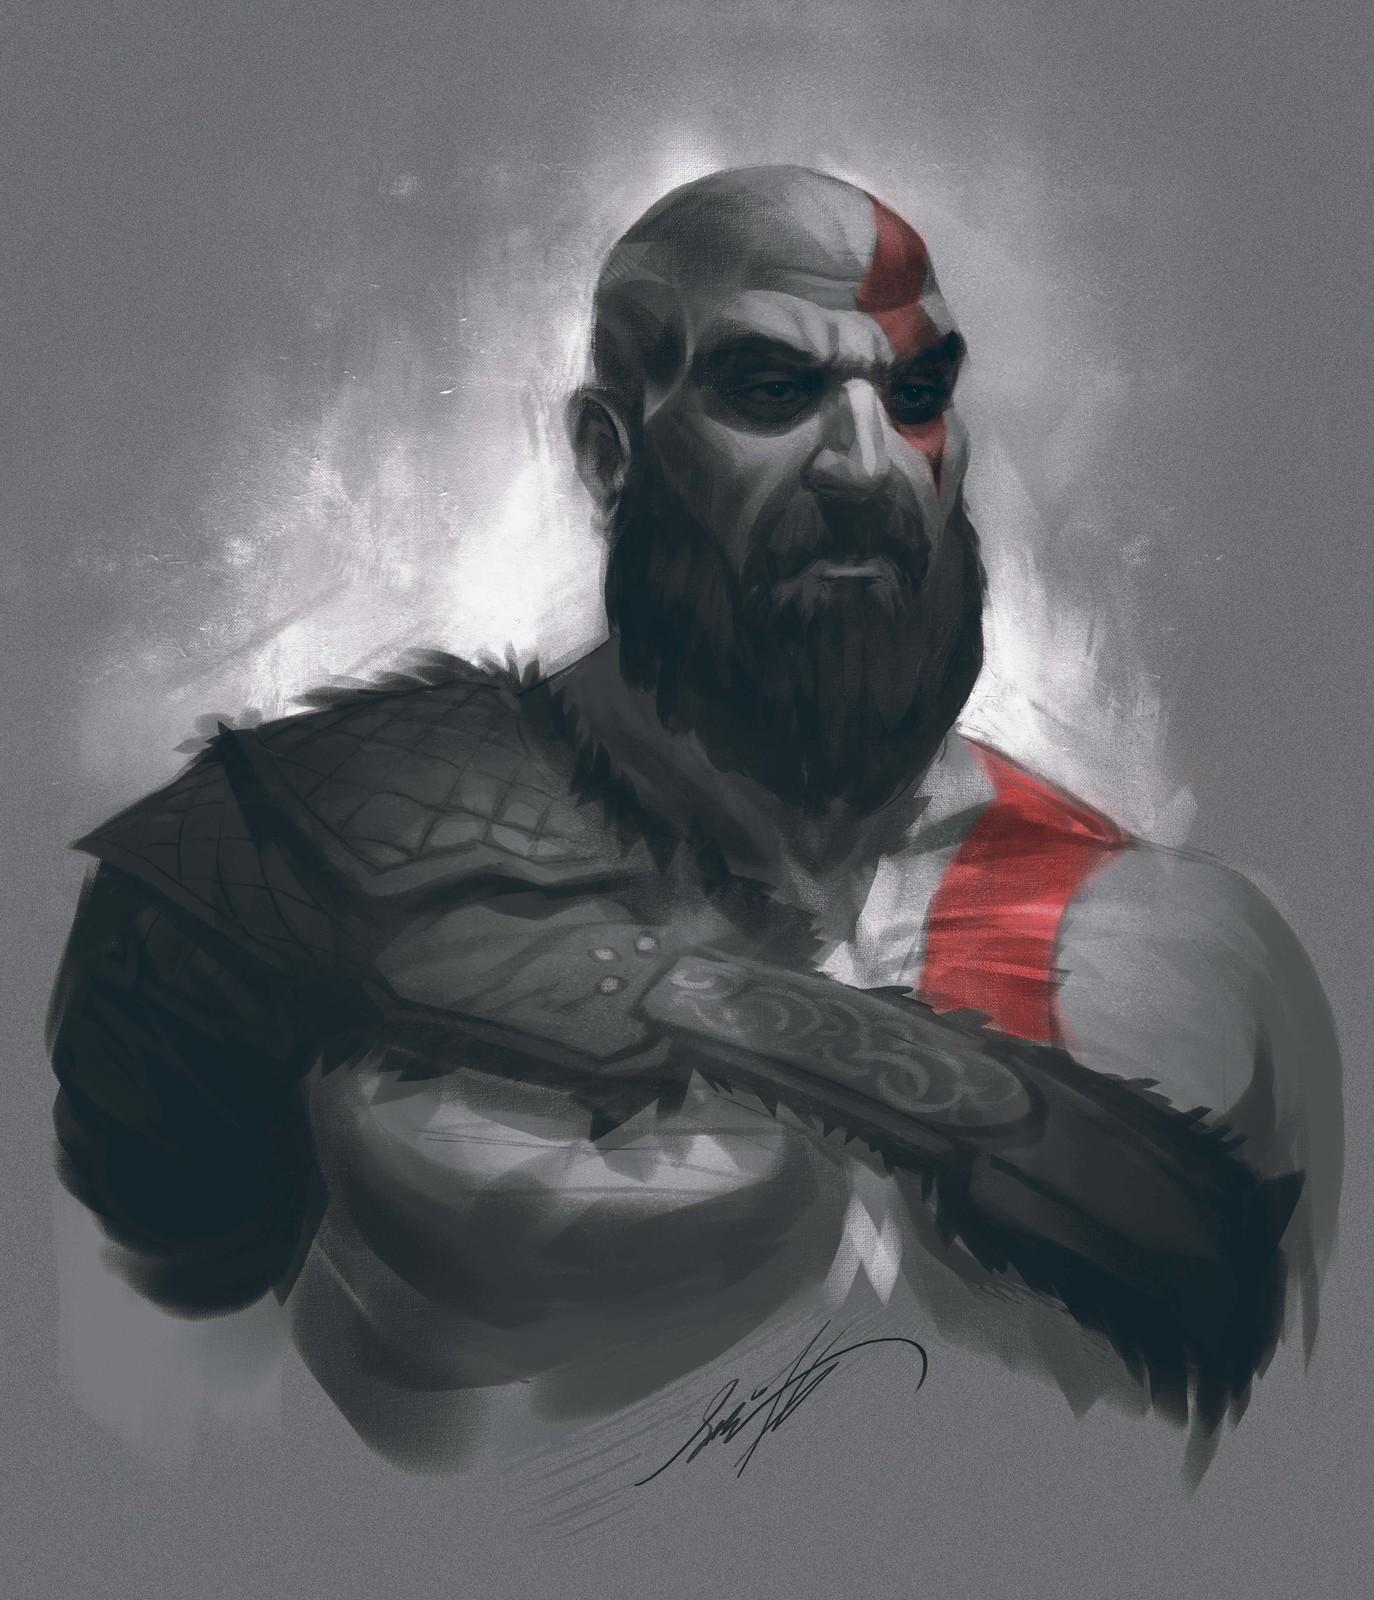 GOD of WAR, a New Begining